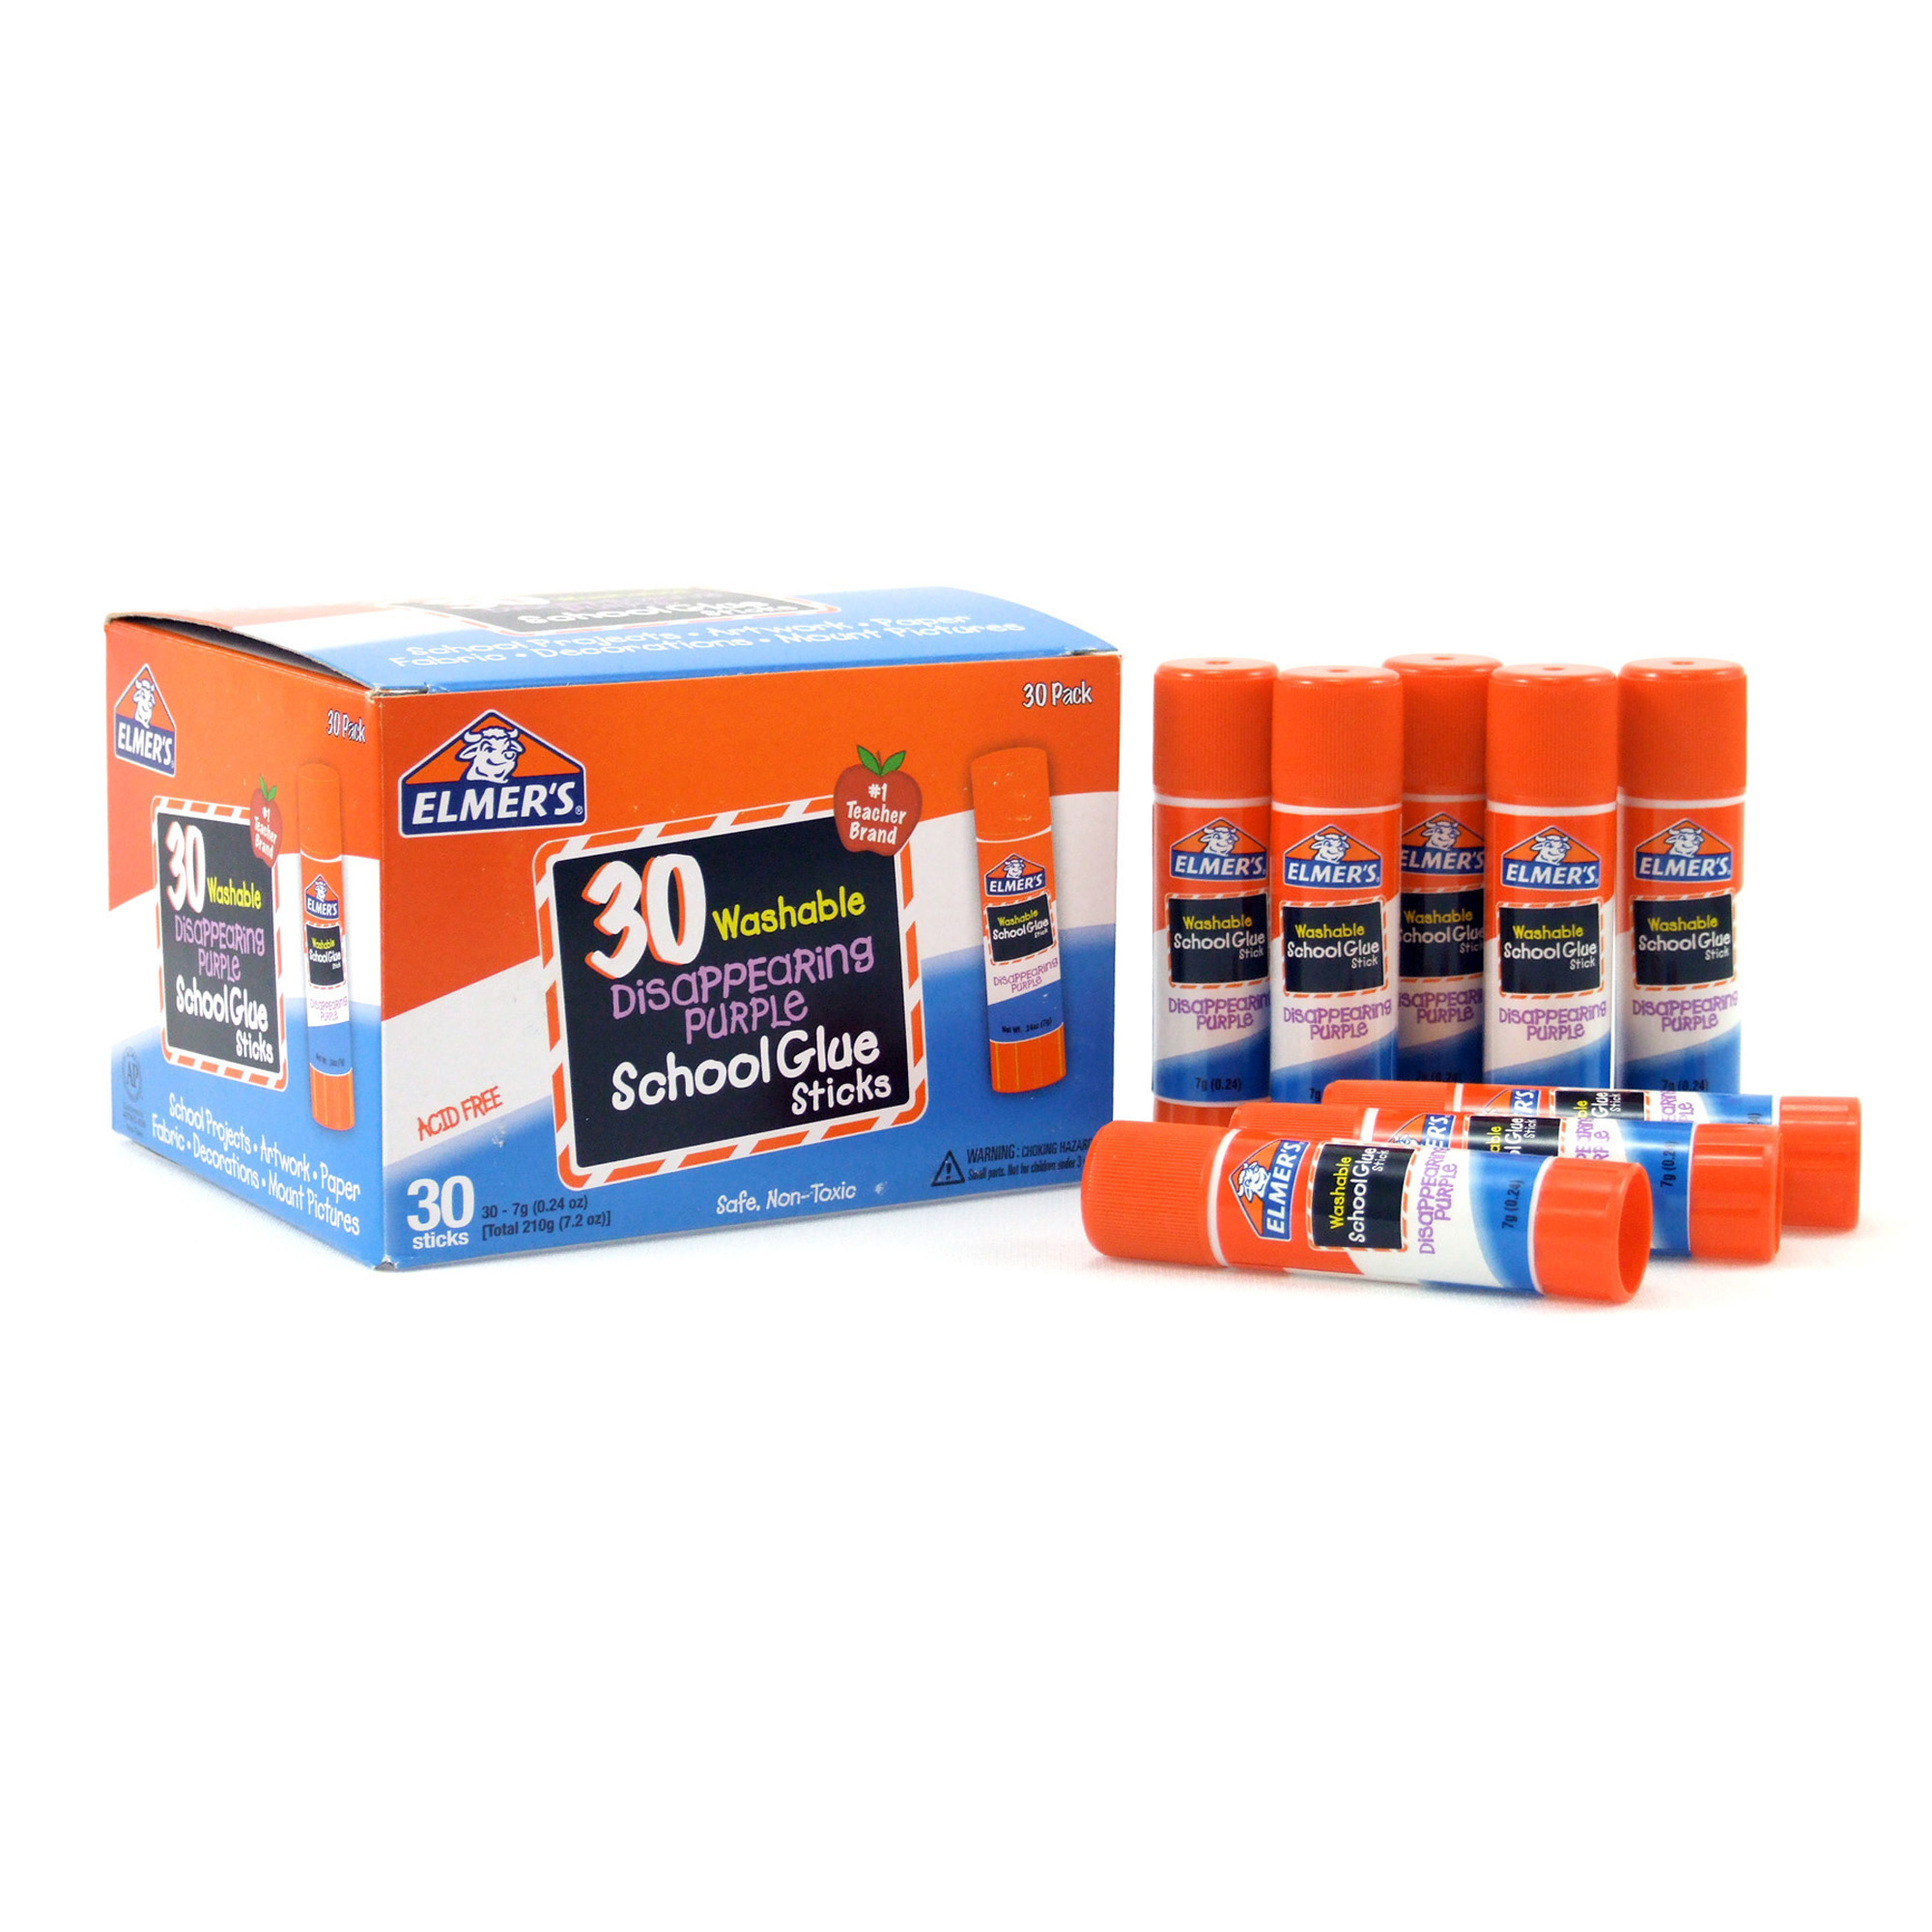 Elmer's® Disappearing Purple Washable School Glue Sticks, 0.24 oz, 30 Count